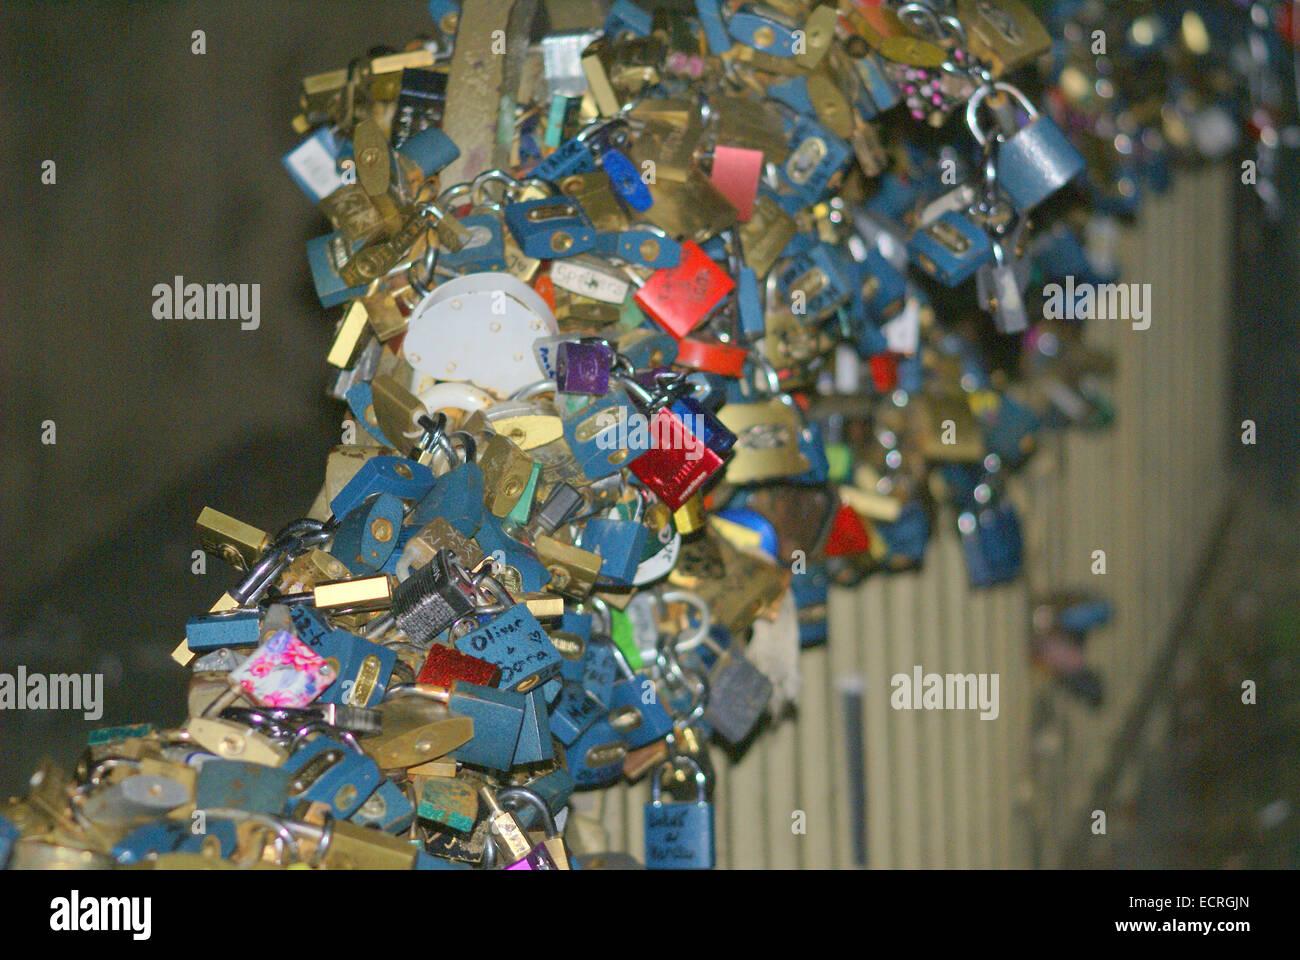 Follow The Fashion Furniture Padlocks On Charles Bridge, City Of Prague,  Czech Republic